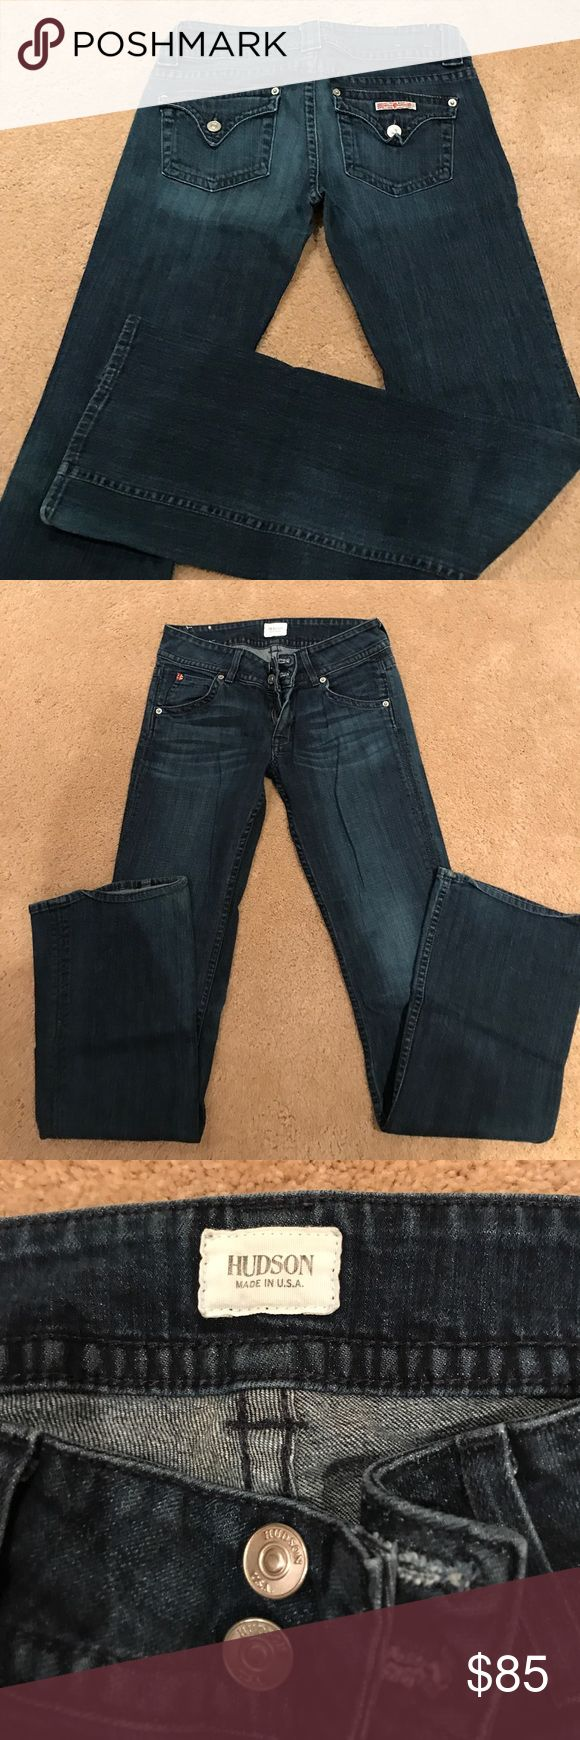 Hudson Womens Bootcut Jeans 27 Hudson womens jeans.  Signature bootcut style.  Medium dark blue rinse.  Back flap pockets.  98% cotton, 2% elastan.  Semi stretchy, super soft.  Great condition.  Size 27. Hudson Jeans Jeans Boot Cut